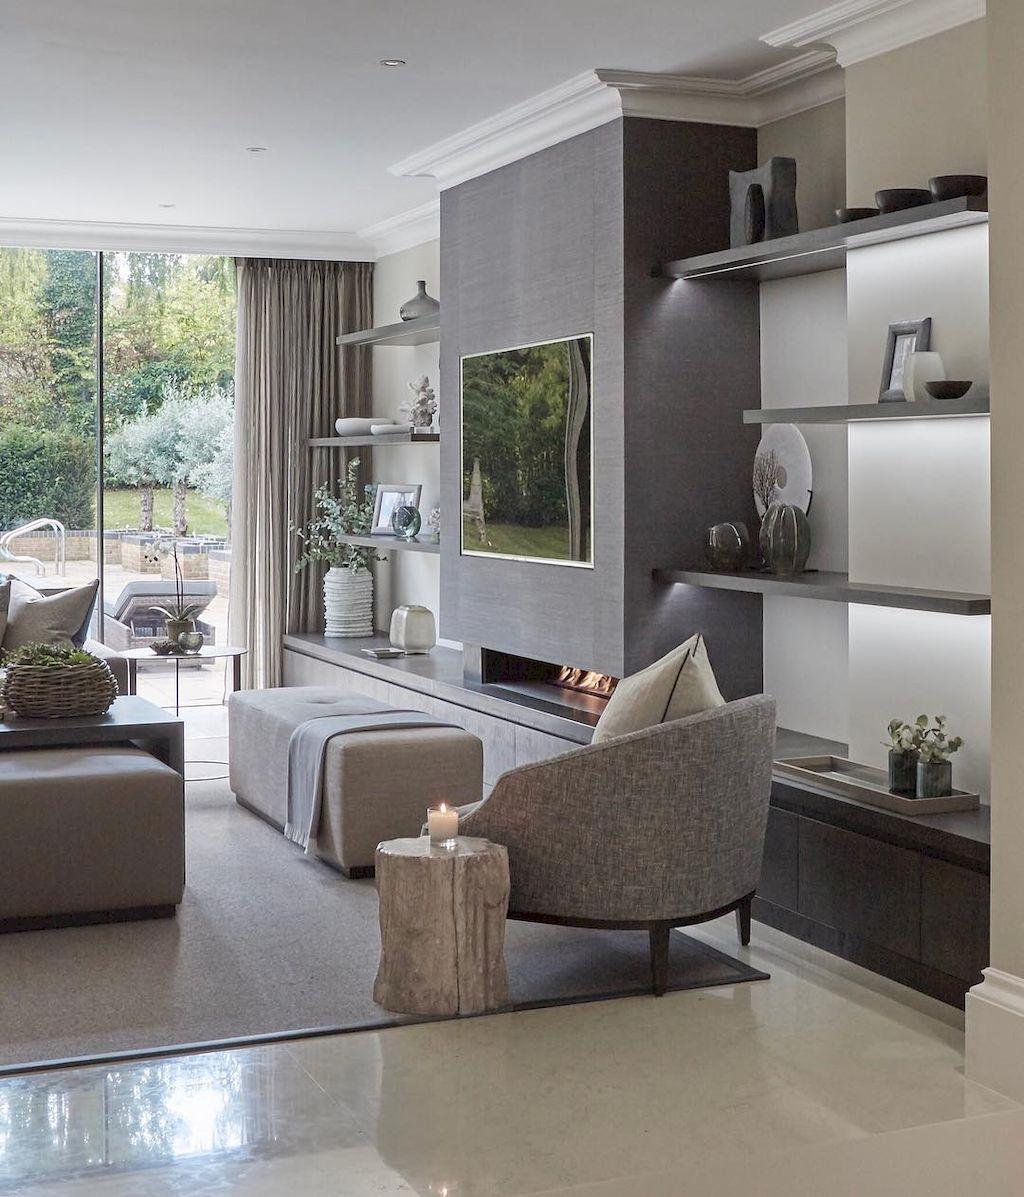 60 TV Wall Living Room Ideas Decor On A Budget   Living Room Decor ...